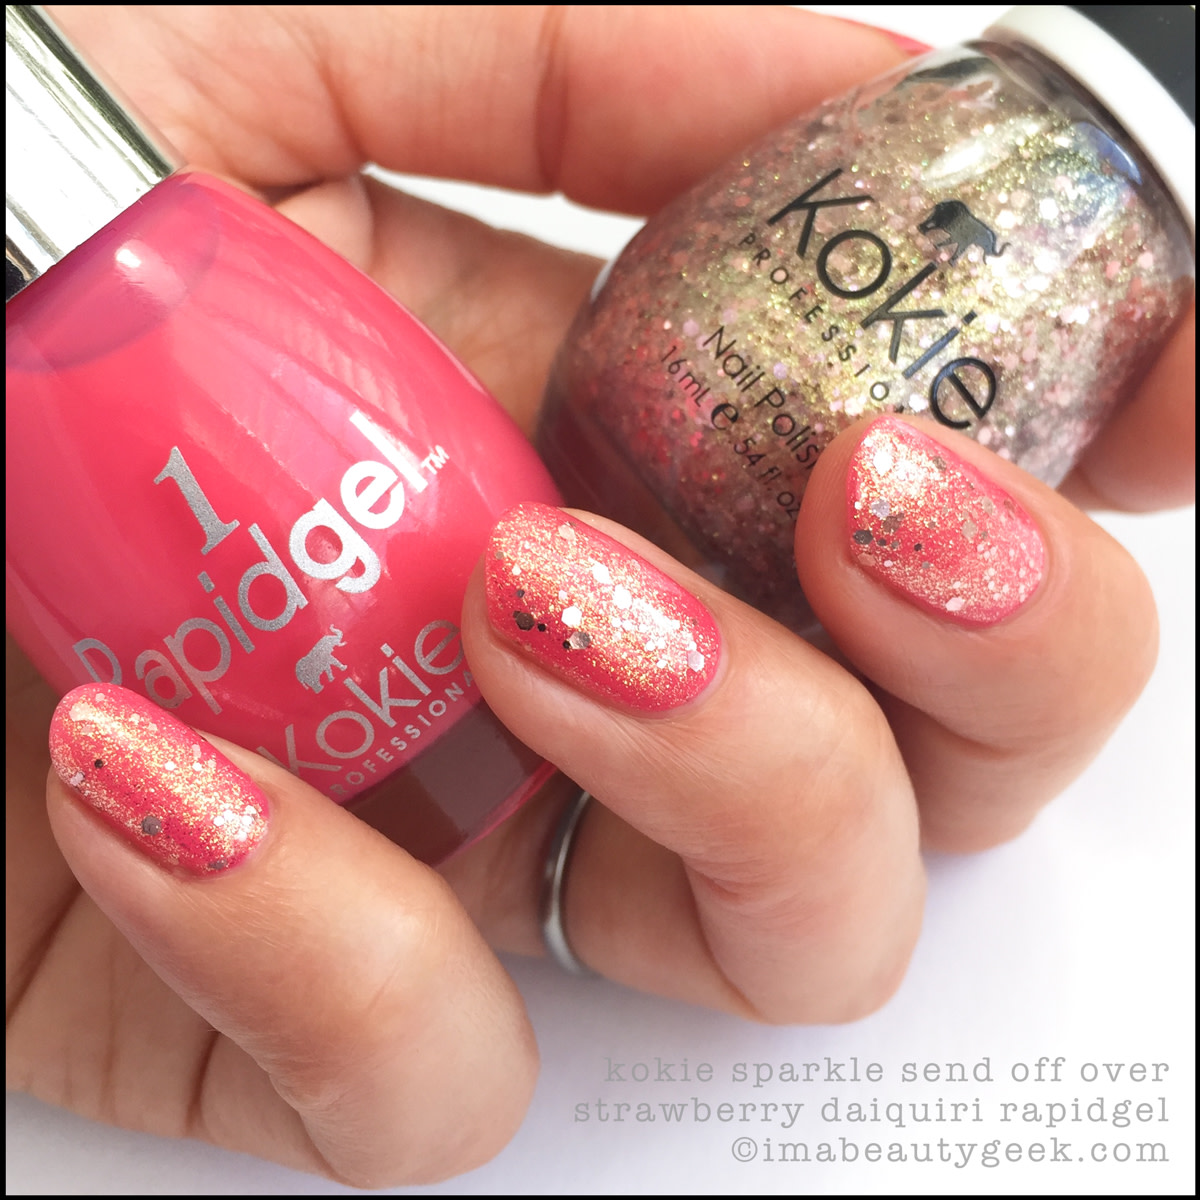 Kokie Nail Polish Sparkle Send Off over Strawberry Daiquiri_Kokie Nail Polish Swatches Review